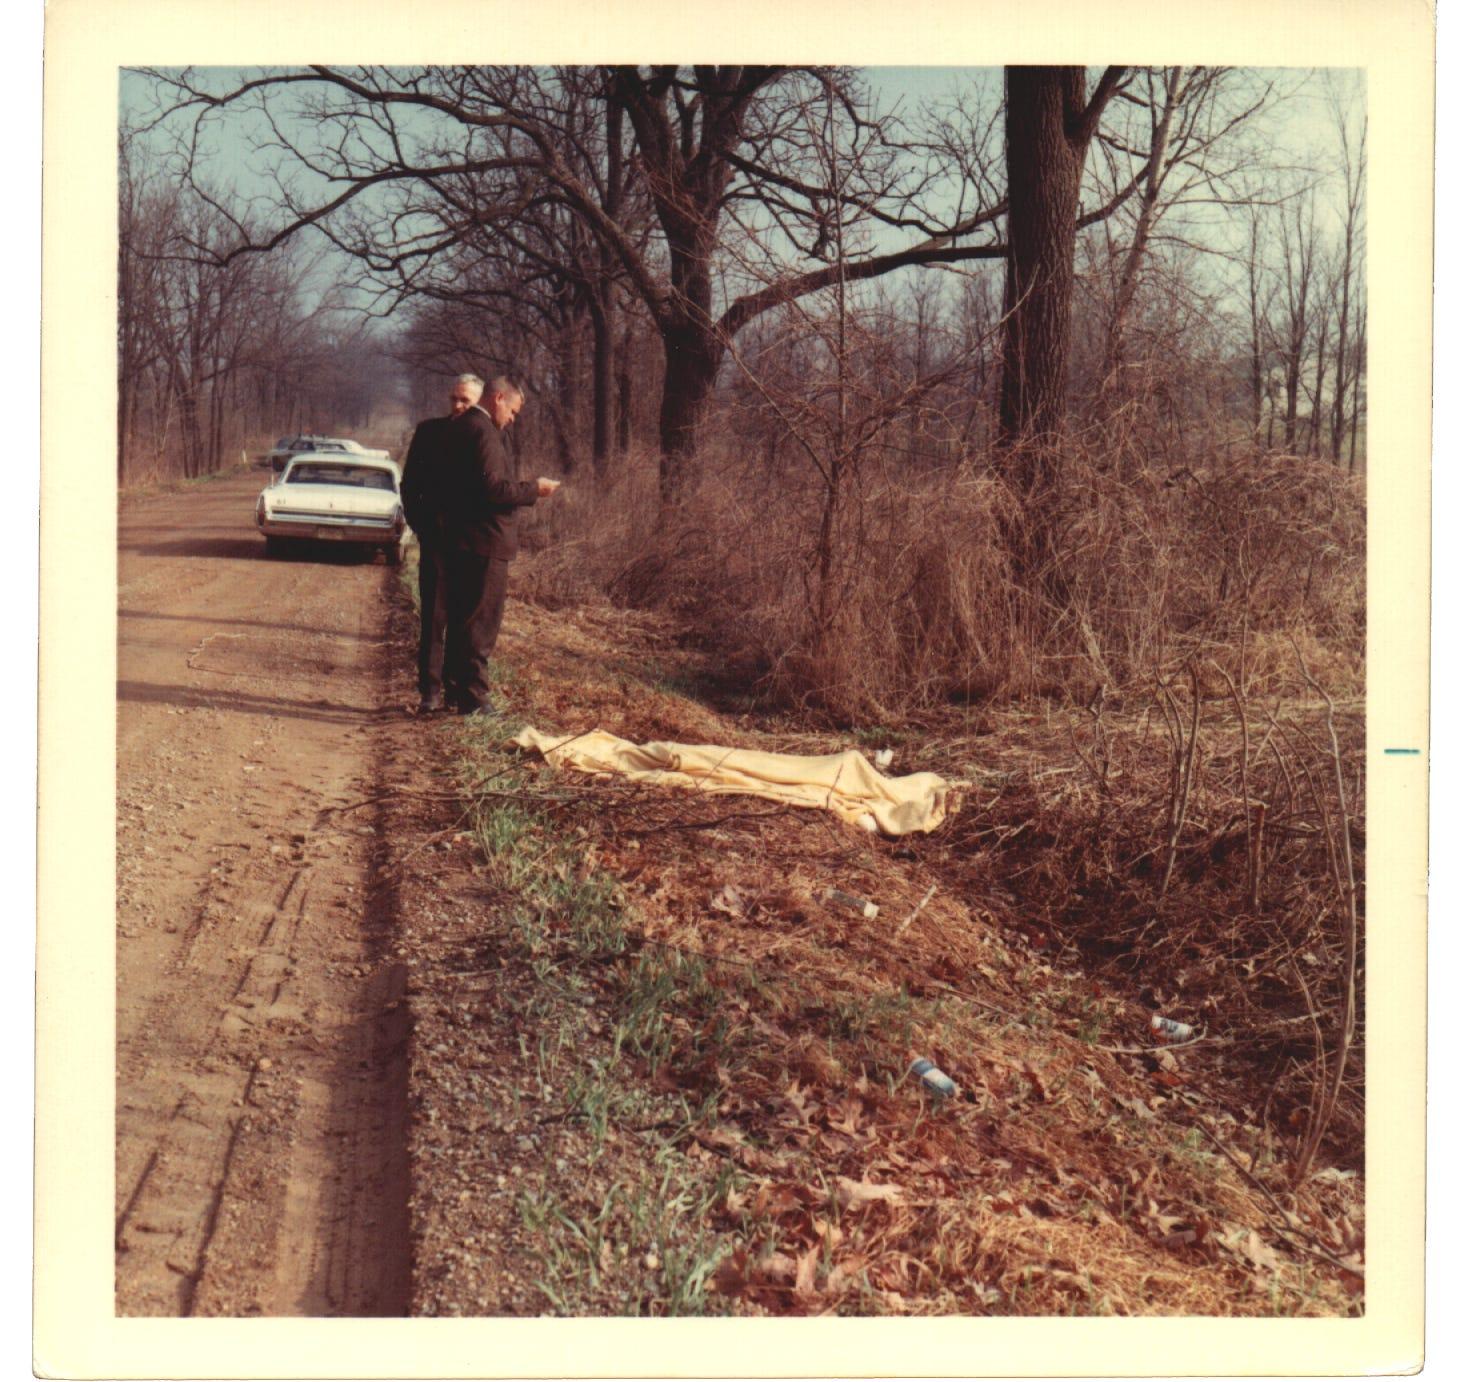 Crime scene photos from the Basom case.